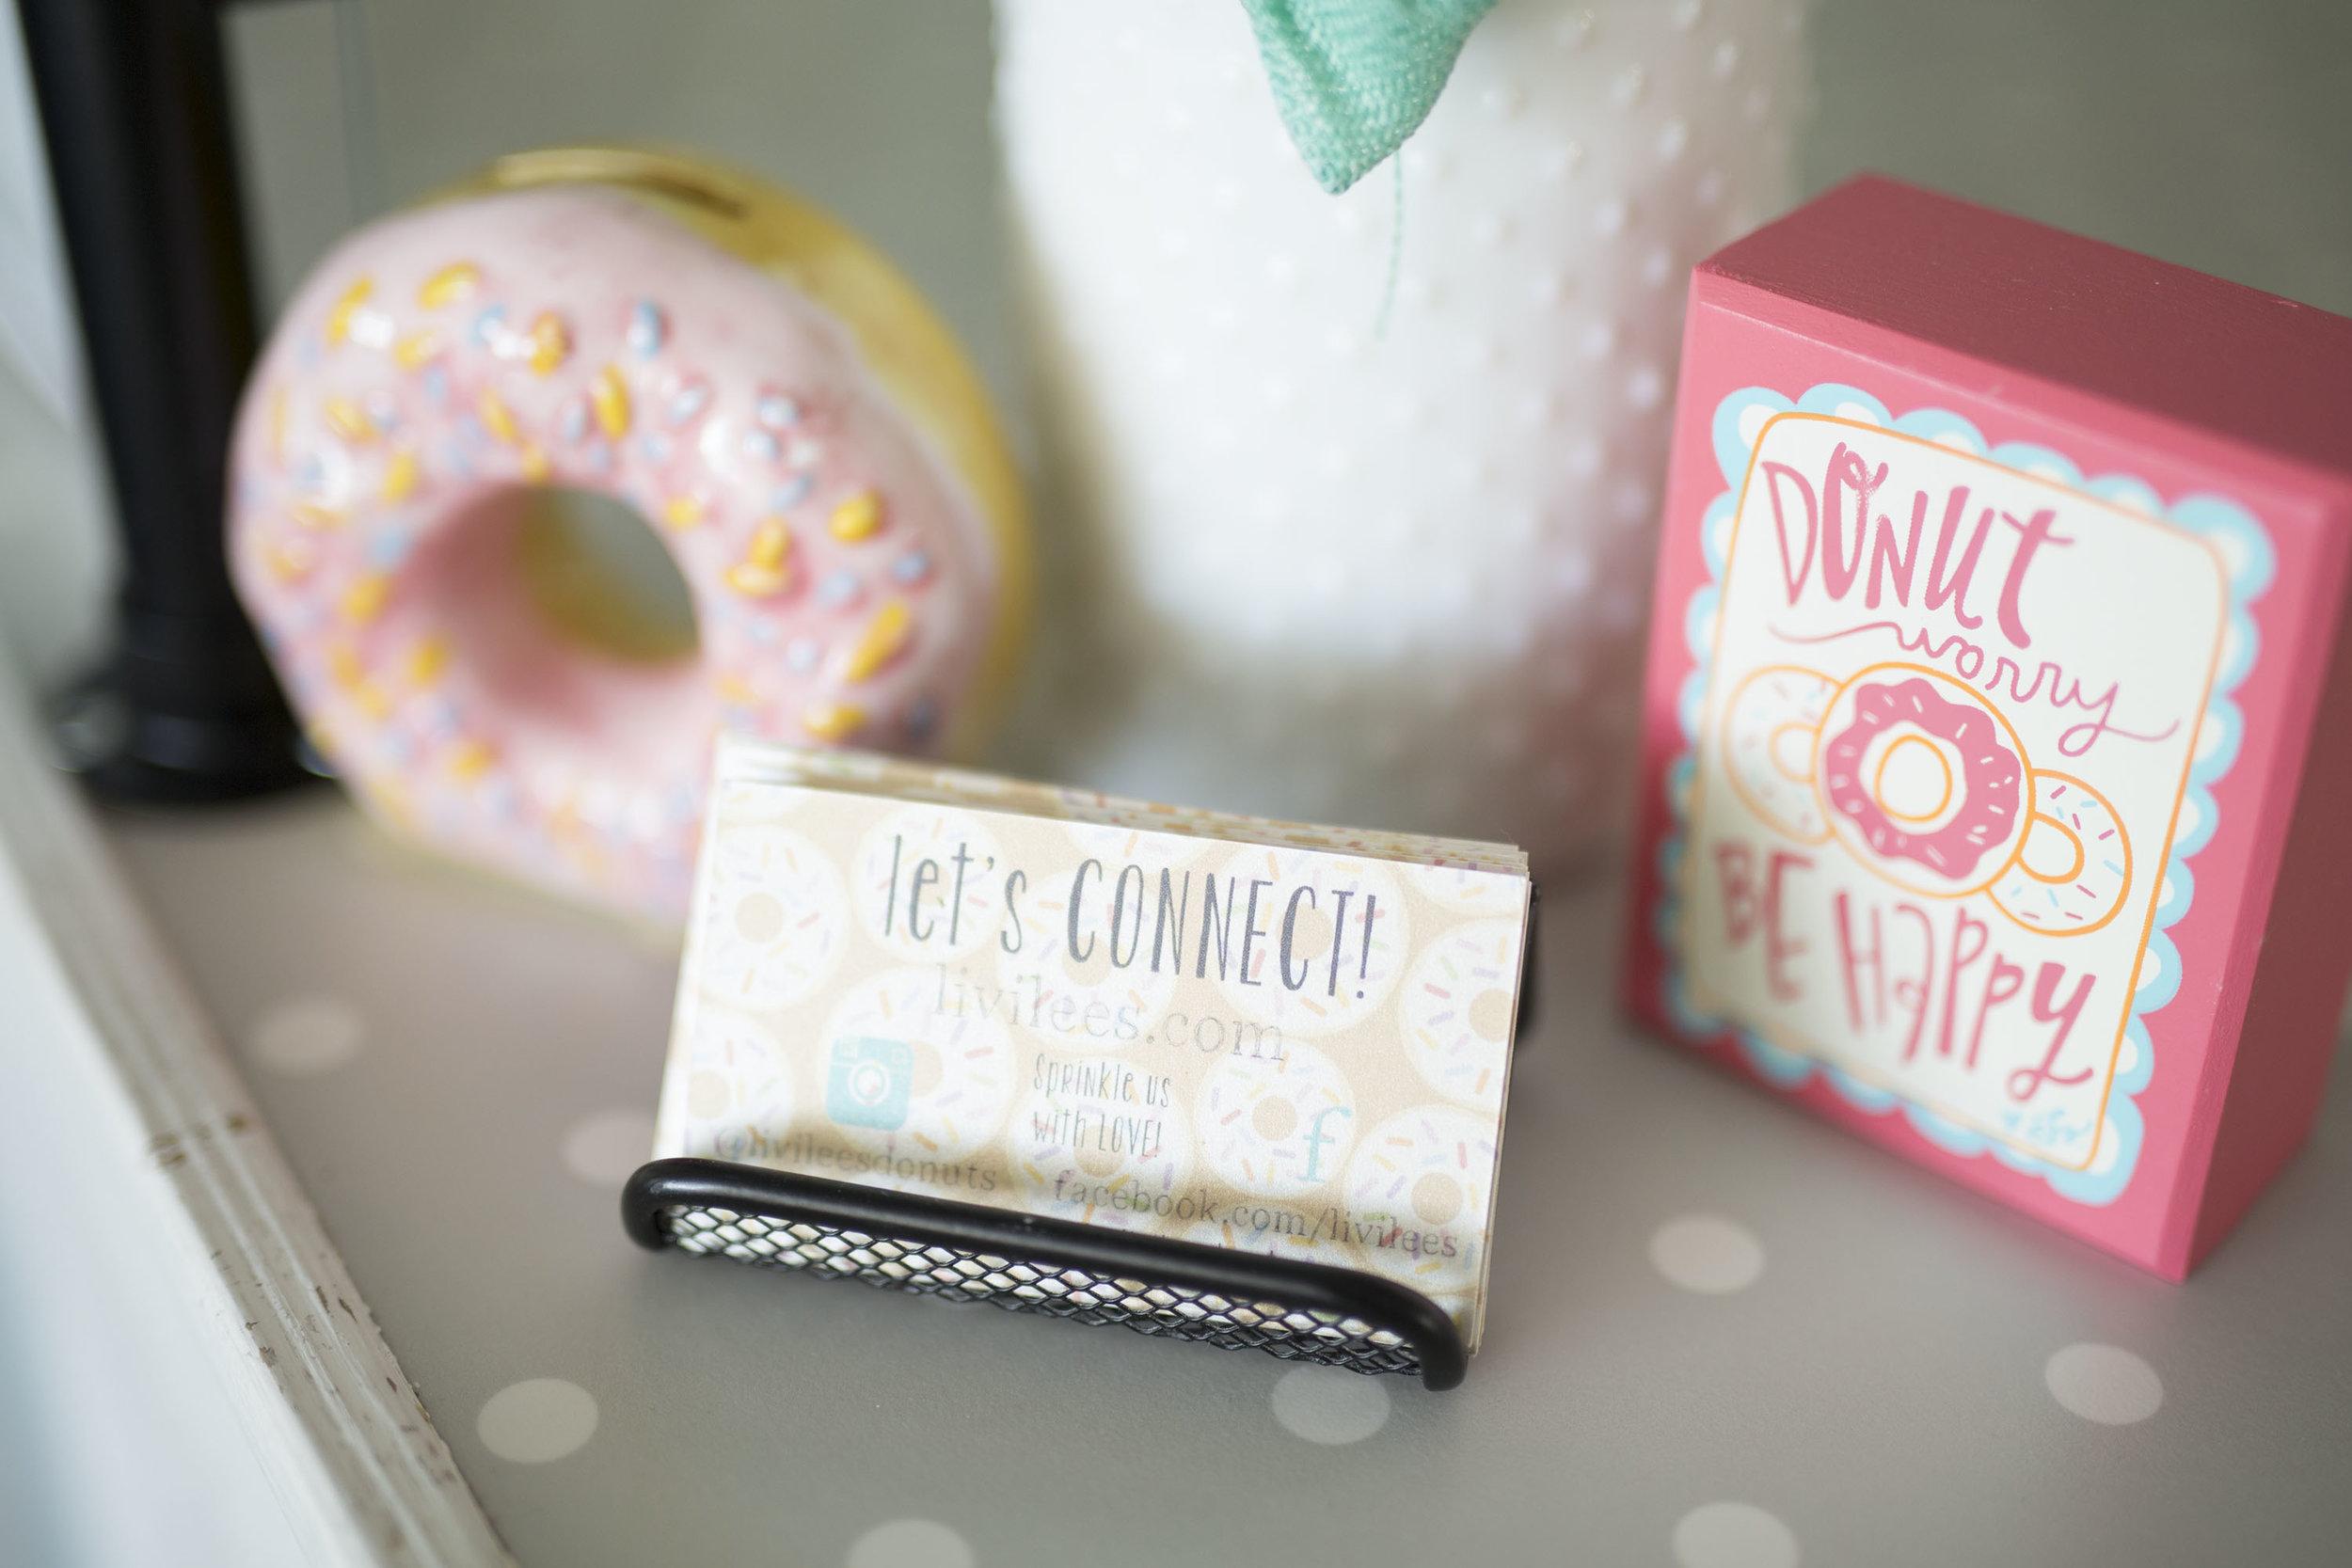 livi lees - donuts - tulsa - oklahoma - donut shops - locally owned - contact livi lees